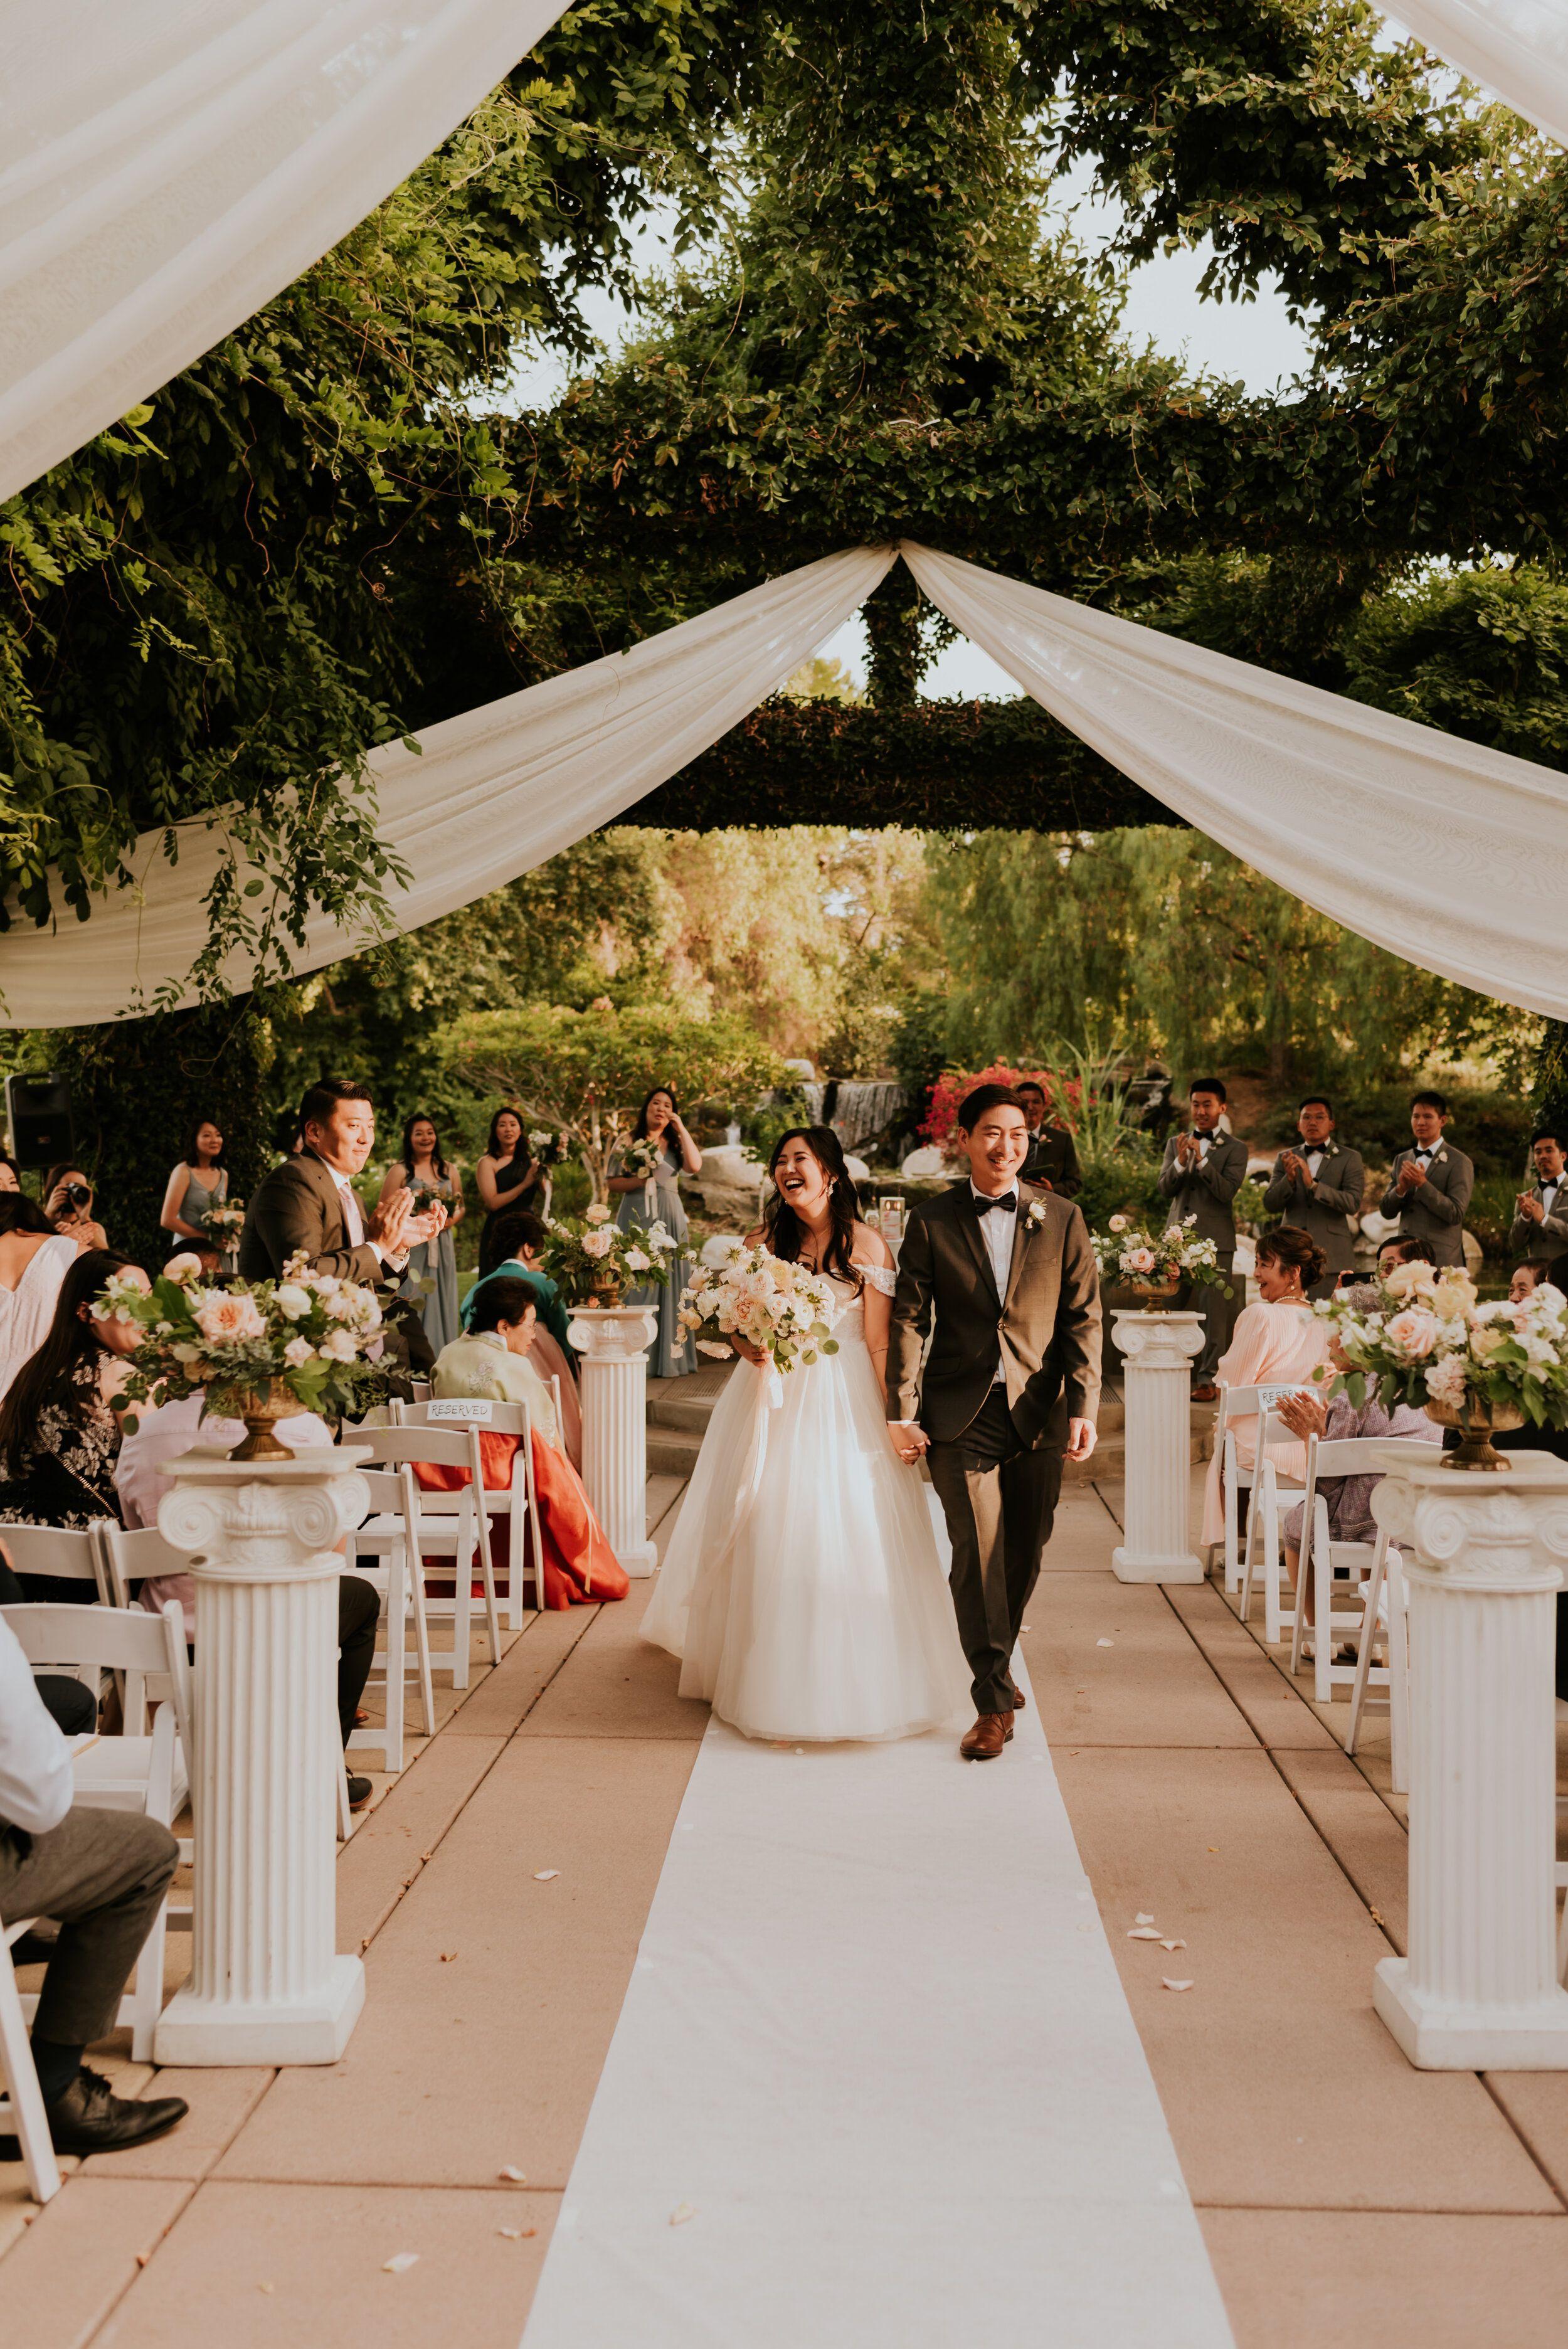 Coyote Hills Golf Course And Fullerton Arboretum Wedding Socal Wedding Venues Wedding Photography Los Angeles California Wedding Photographers